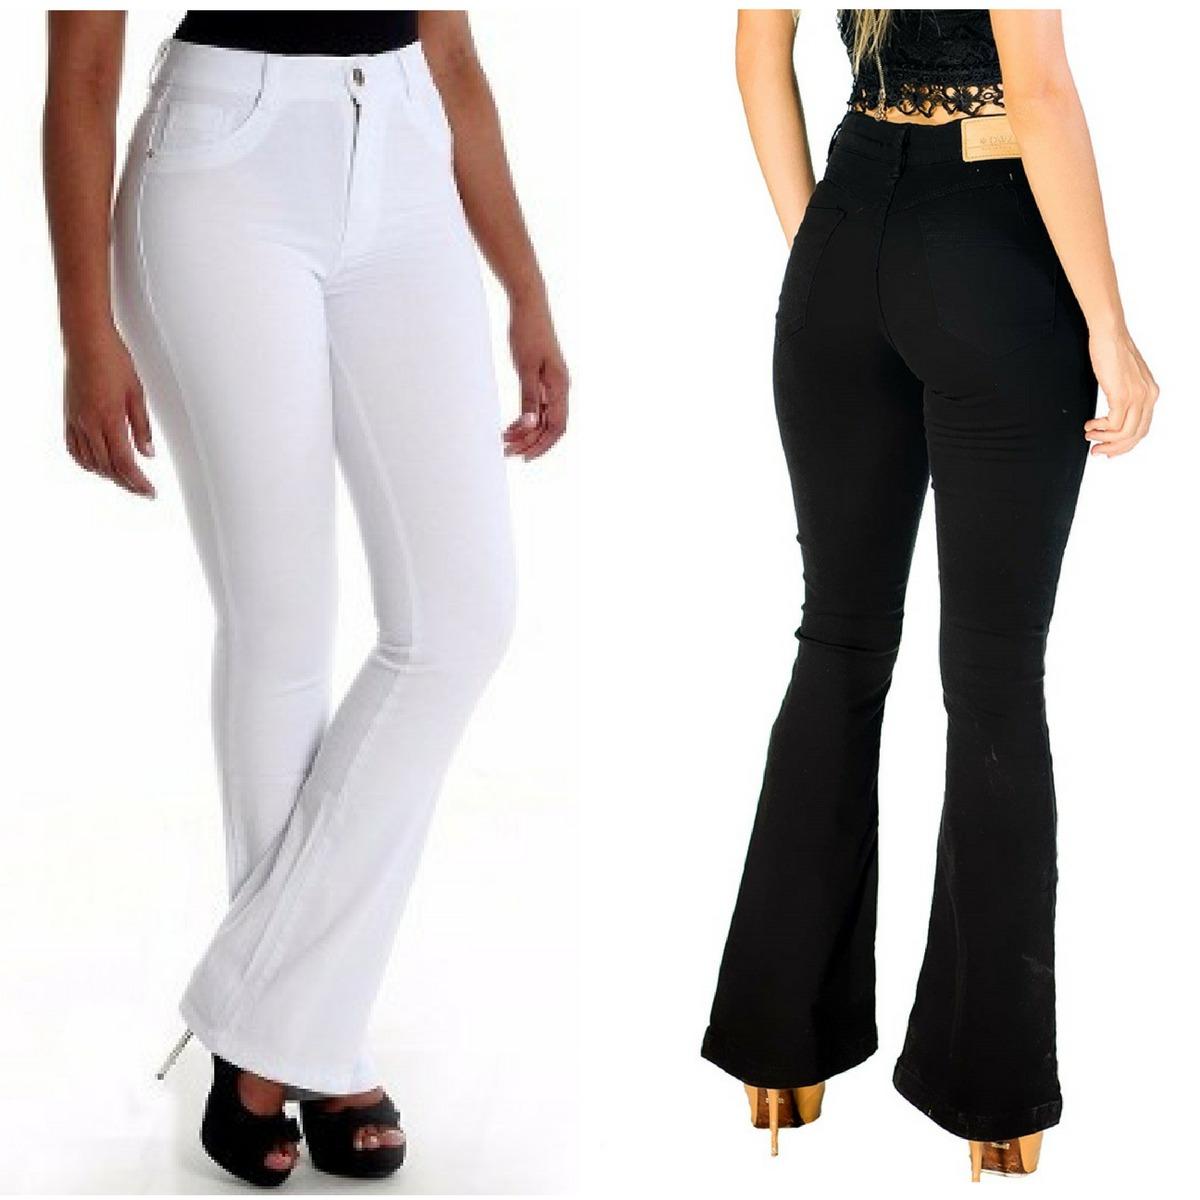 8ec3206b7 calca flare jeans feminina branca ou preta cintura alta 2018. Carregando  zoom.